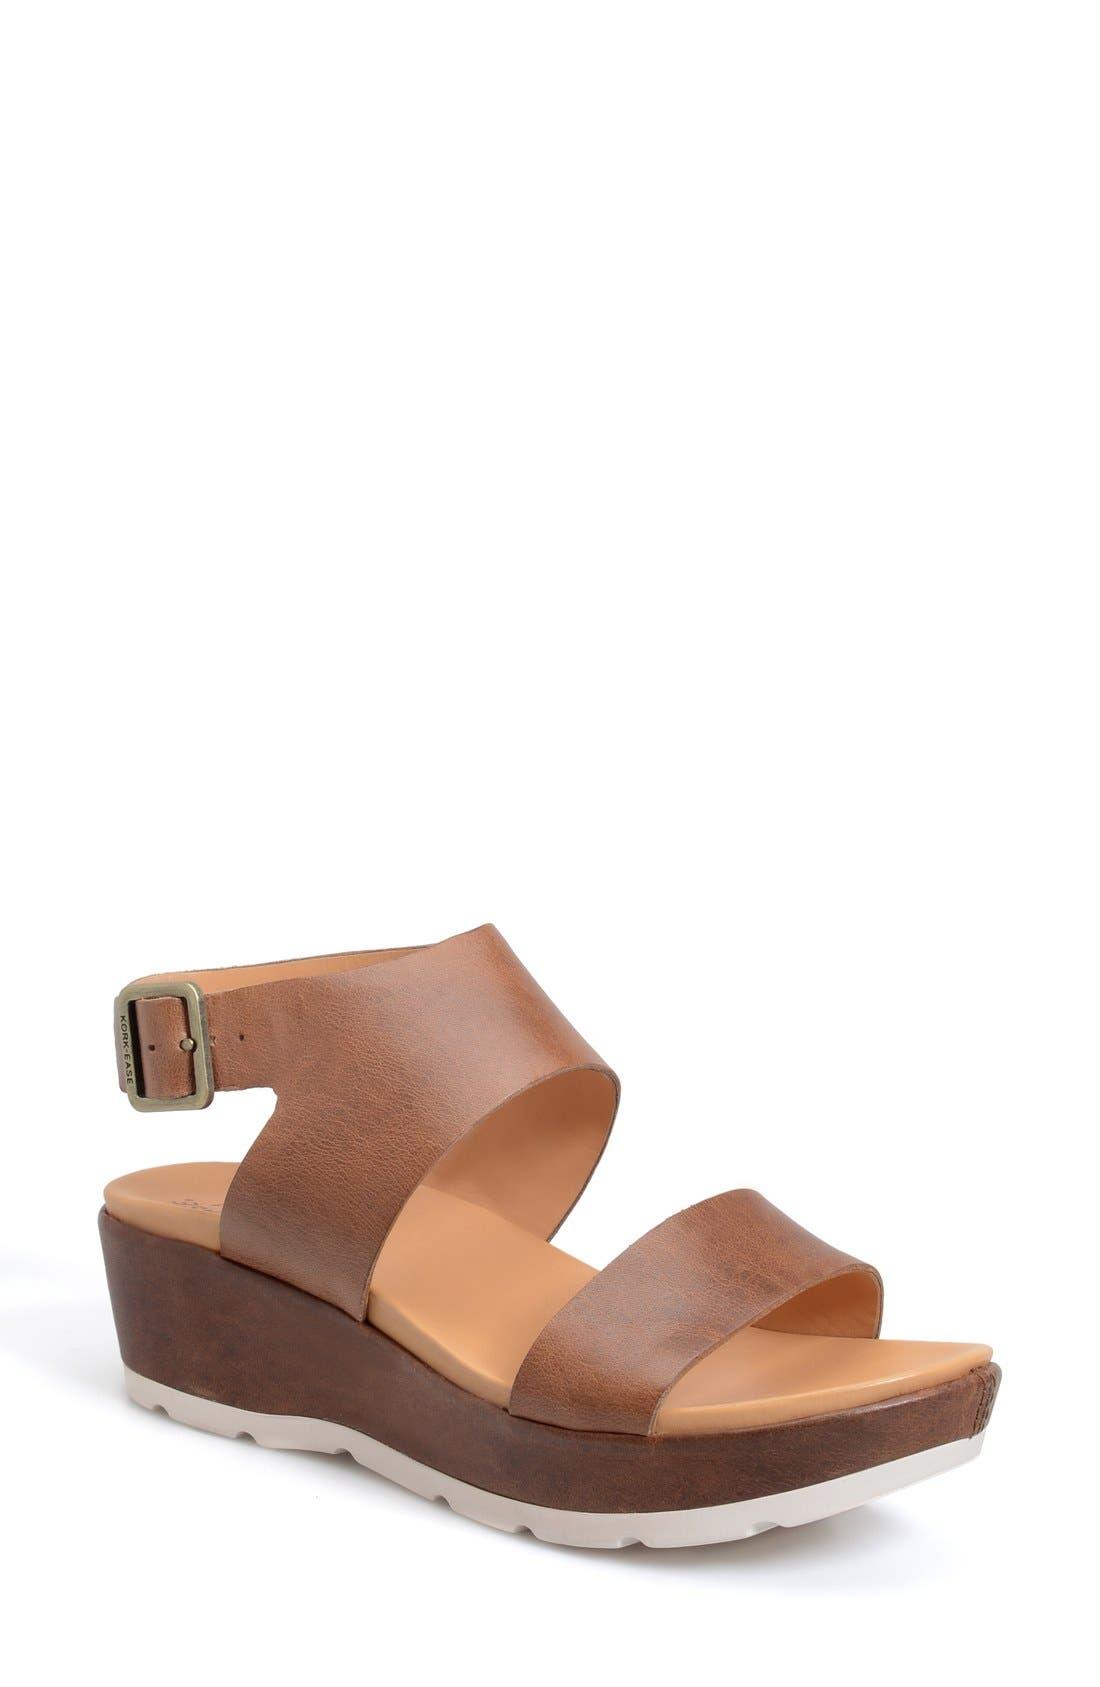 'Khloe' Platform Wedge Sandal,                             Main thumbnail 2, color,